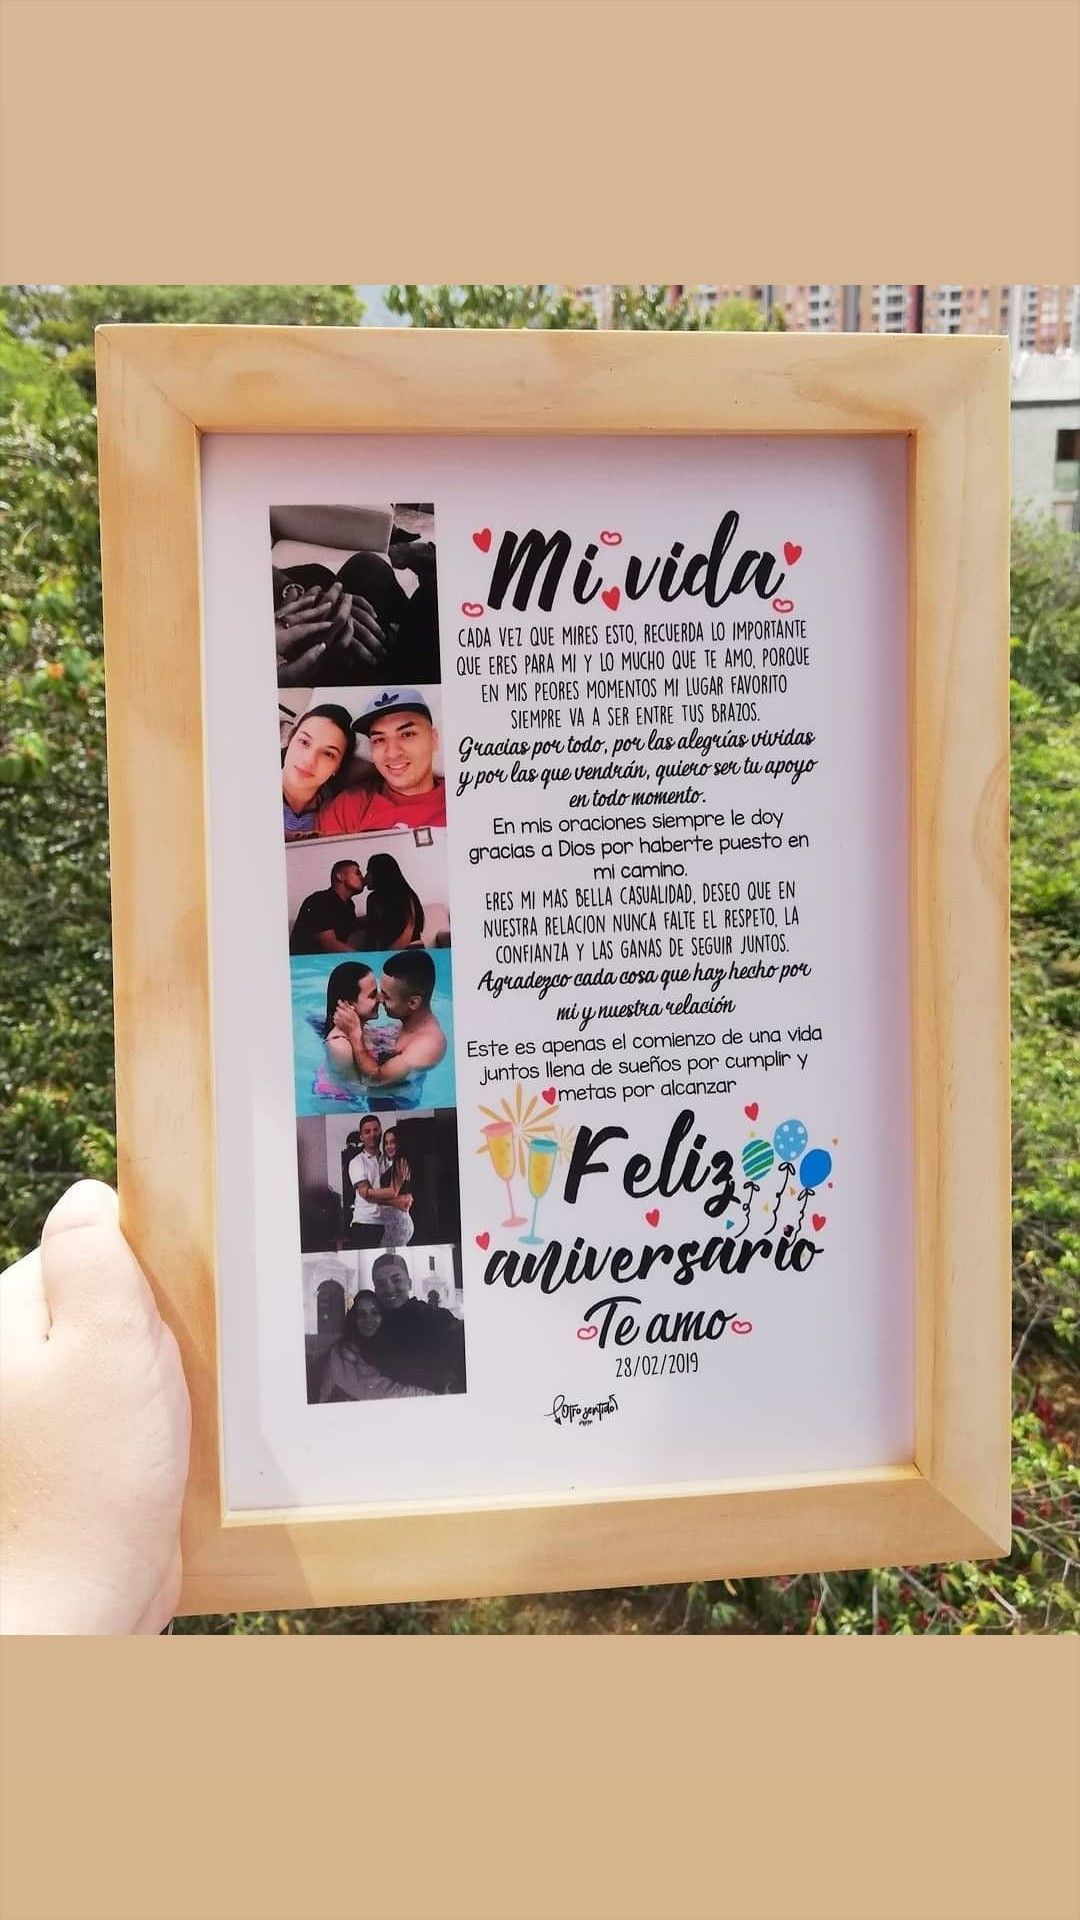 Pin De Maura Reyes En Ideas Para Regalitos Regalo Para Novia Manualidades Regalos Para Novio Hechos A Mano Regalos De Cumpleaños Para Novio